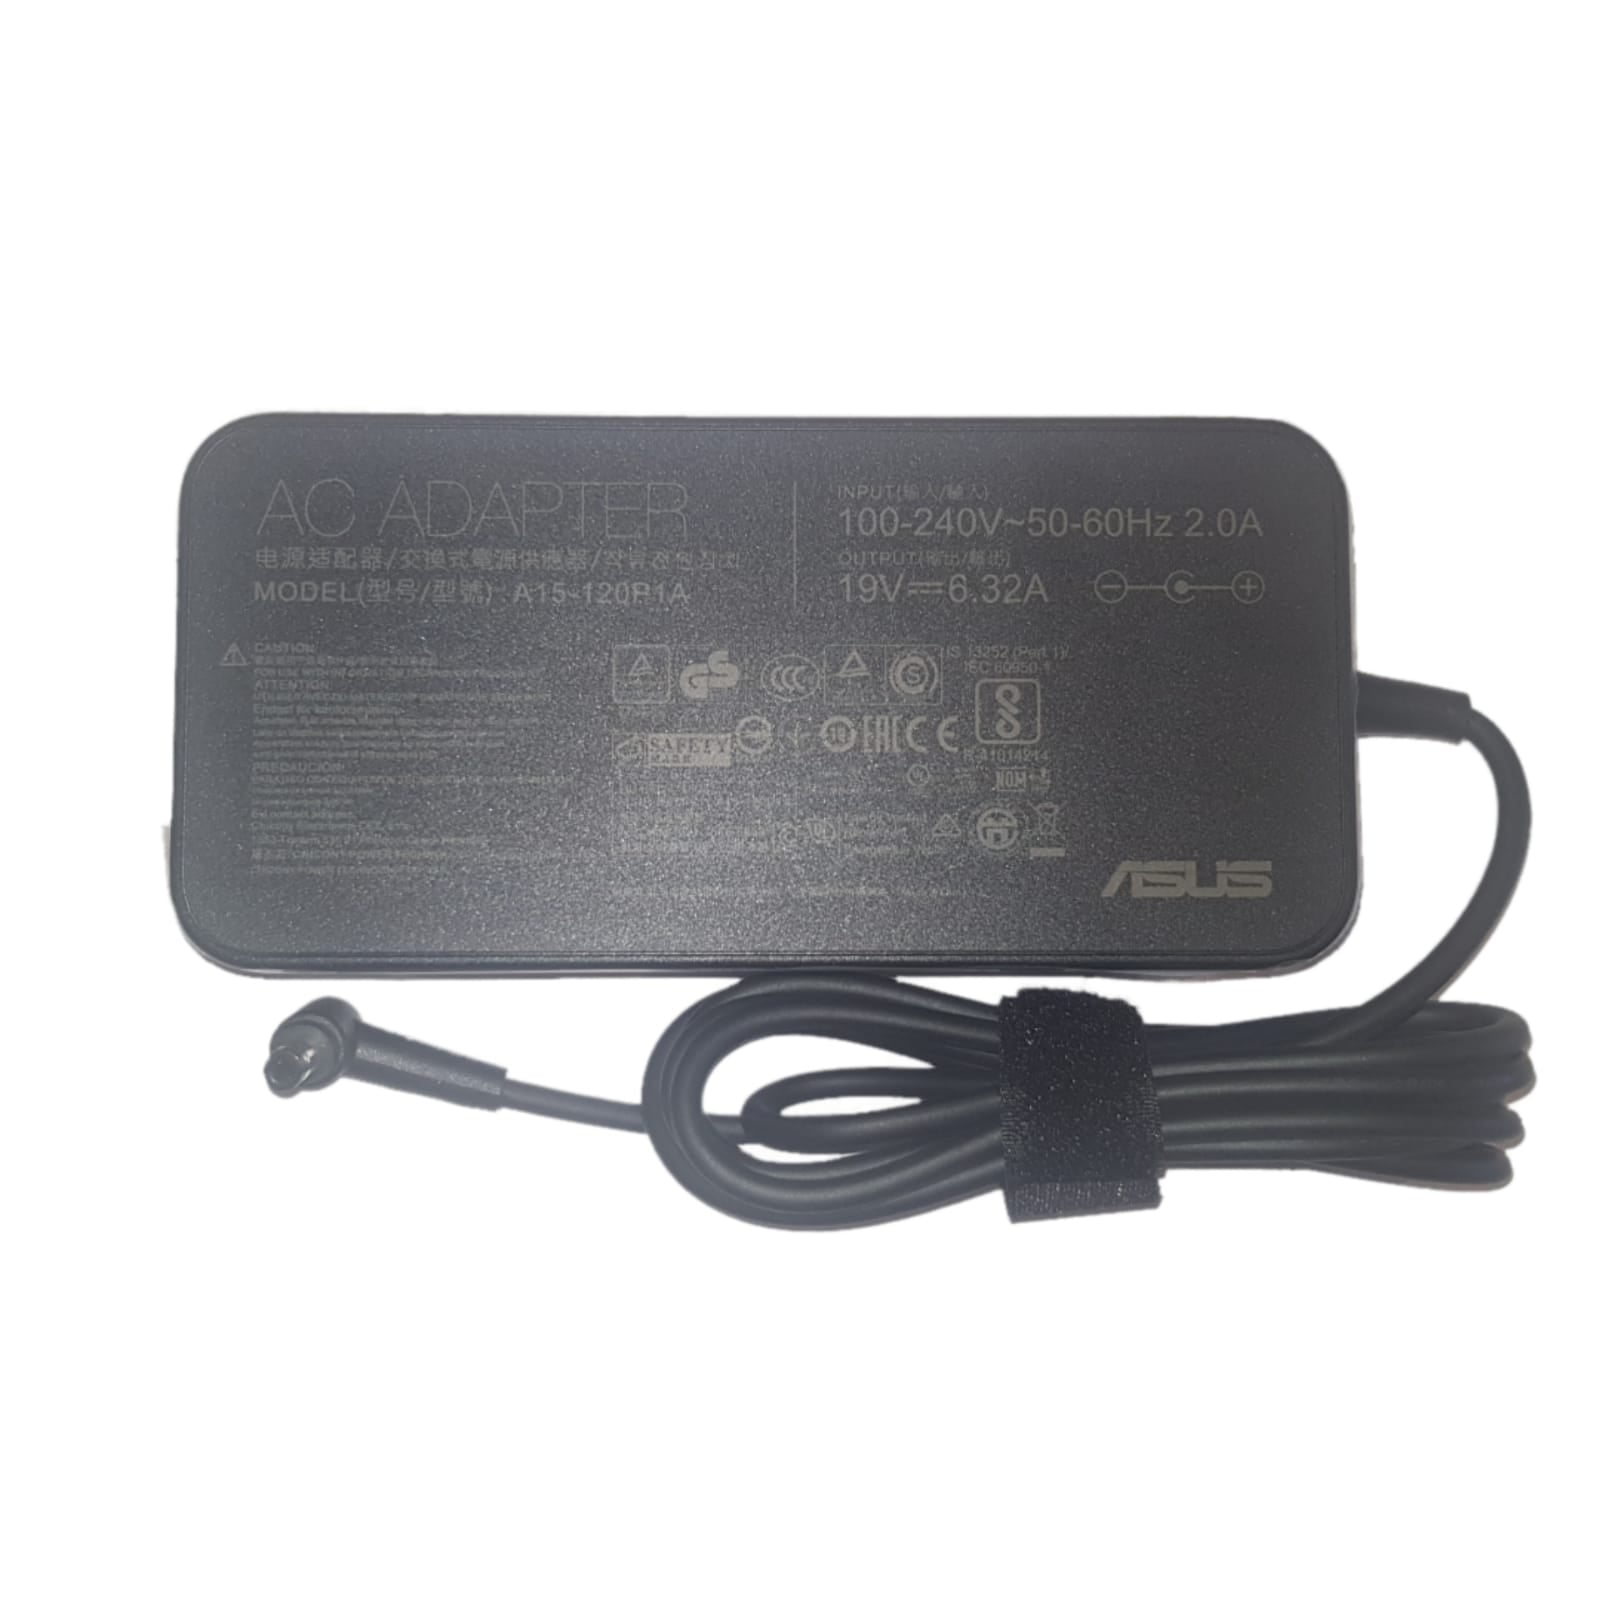 מטען למחשב נייד אסוס Asus N751JK